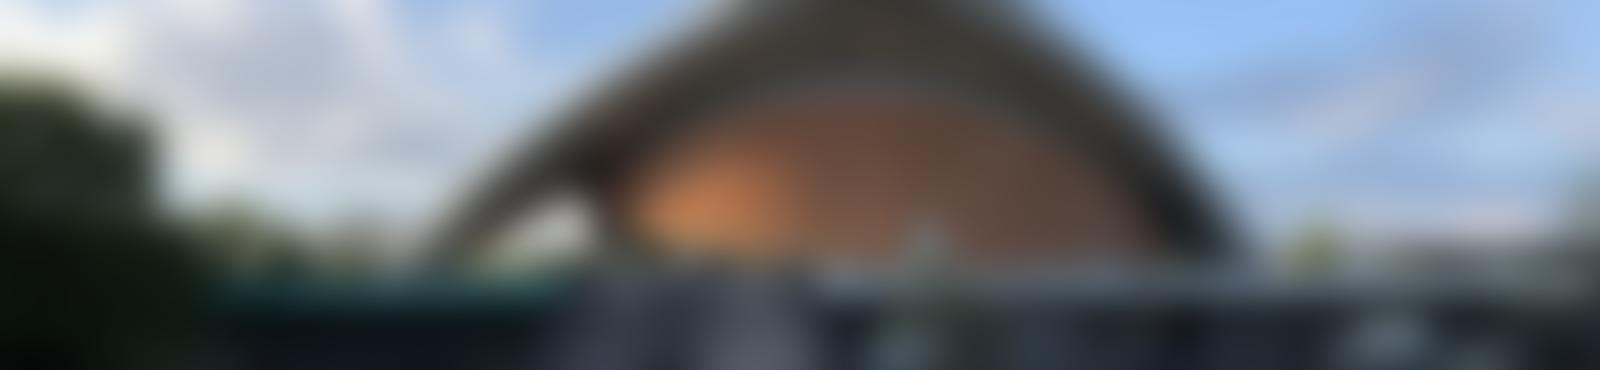 Blurred dfb3a3ae dbed 45f7 9cf4 e1e06665395c